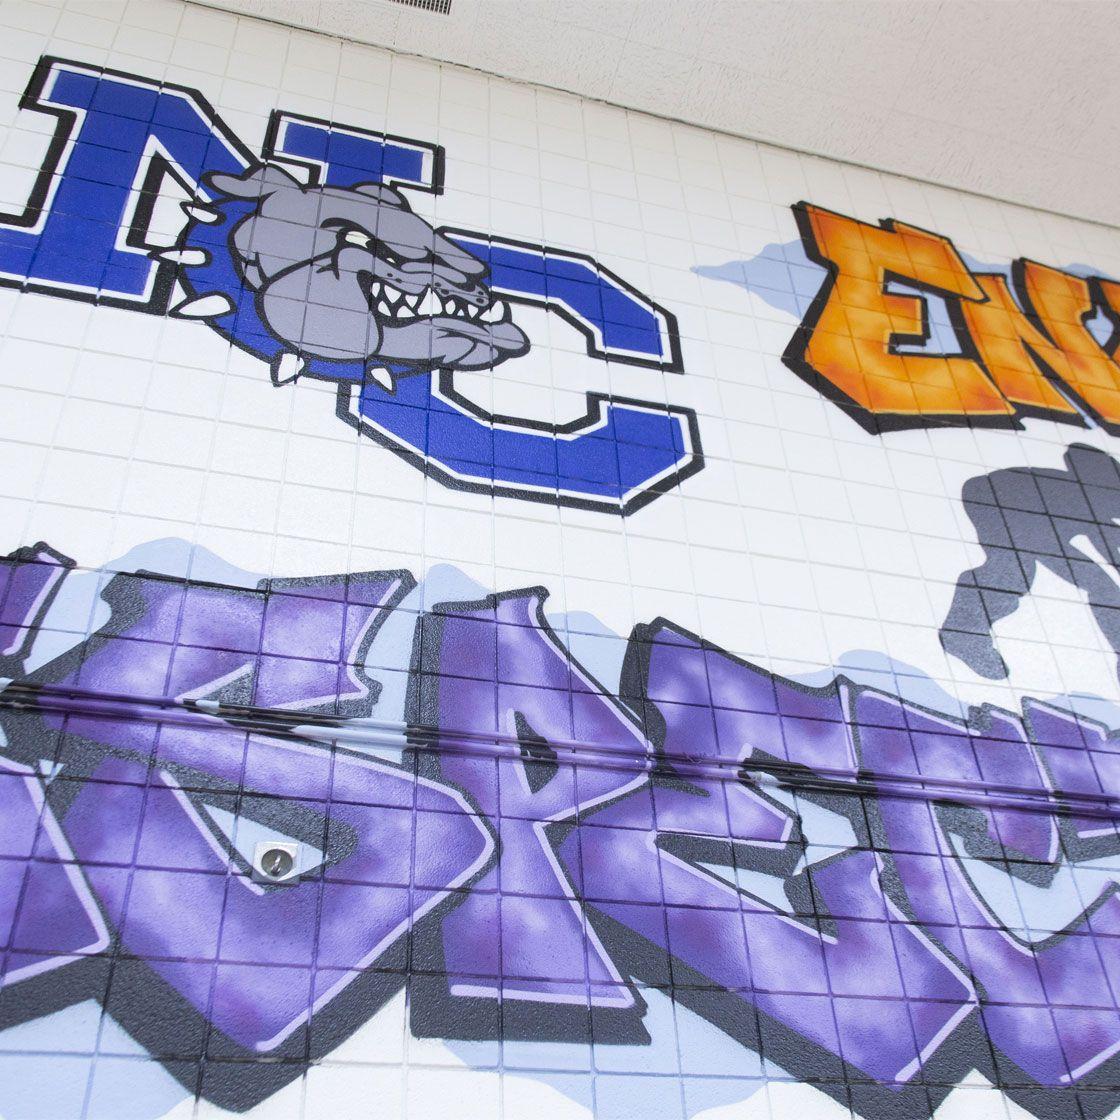 A closuep of a graffiti-style mural